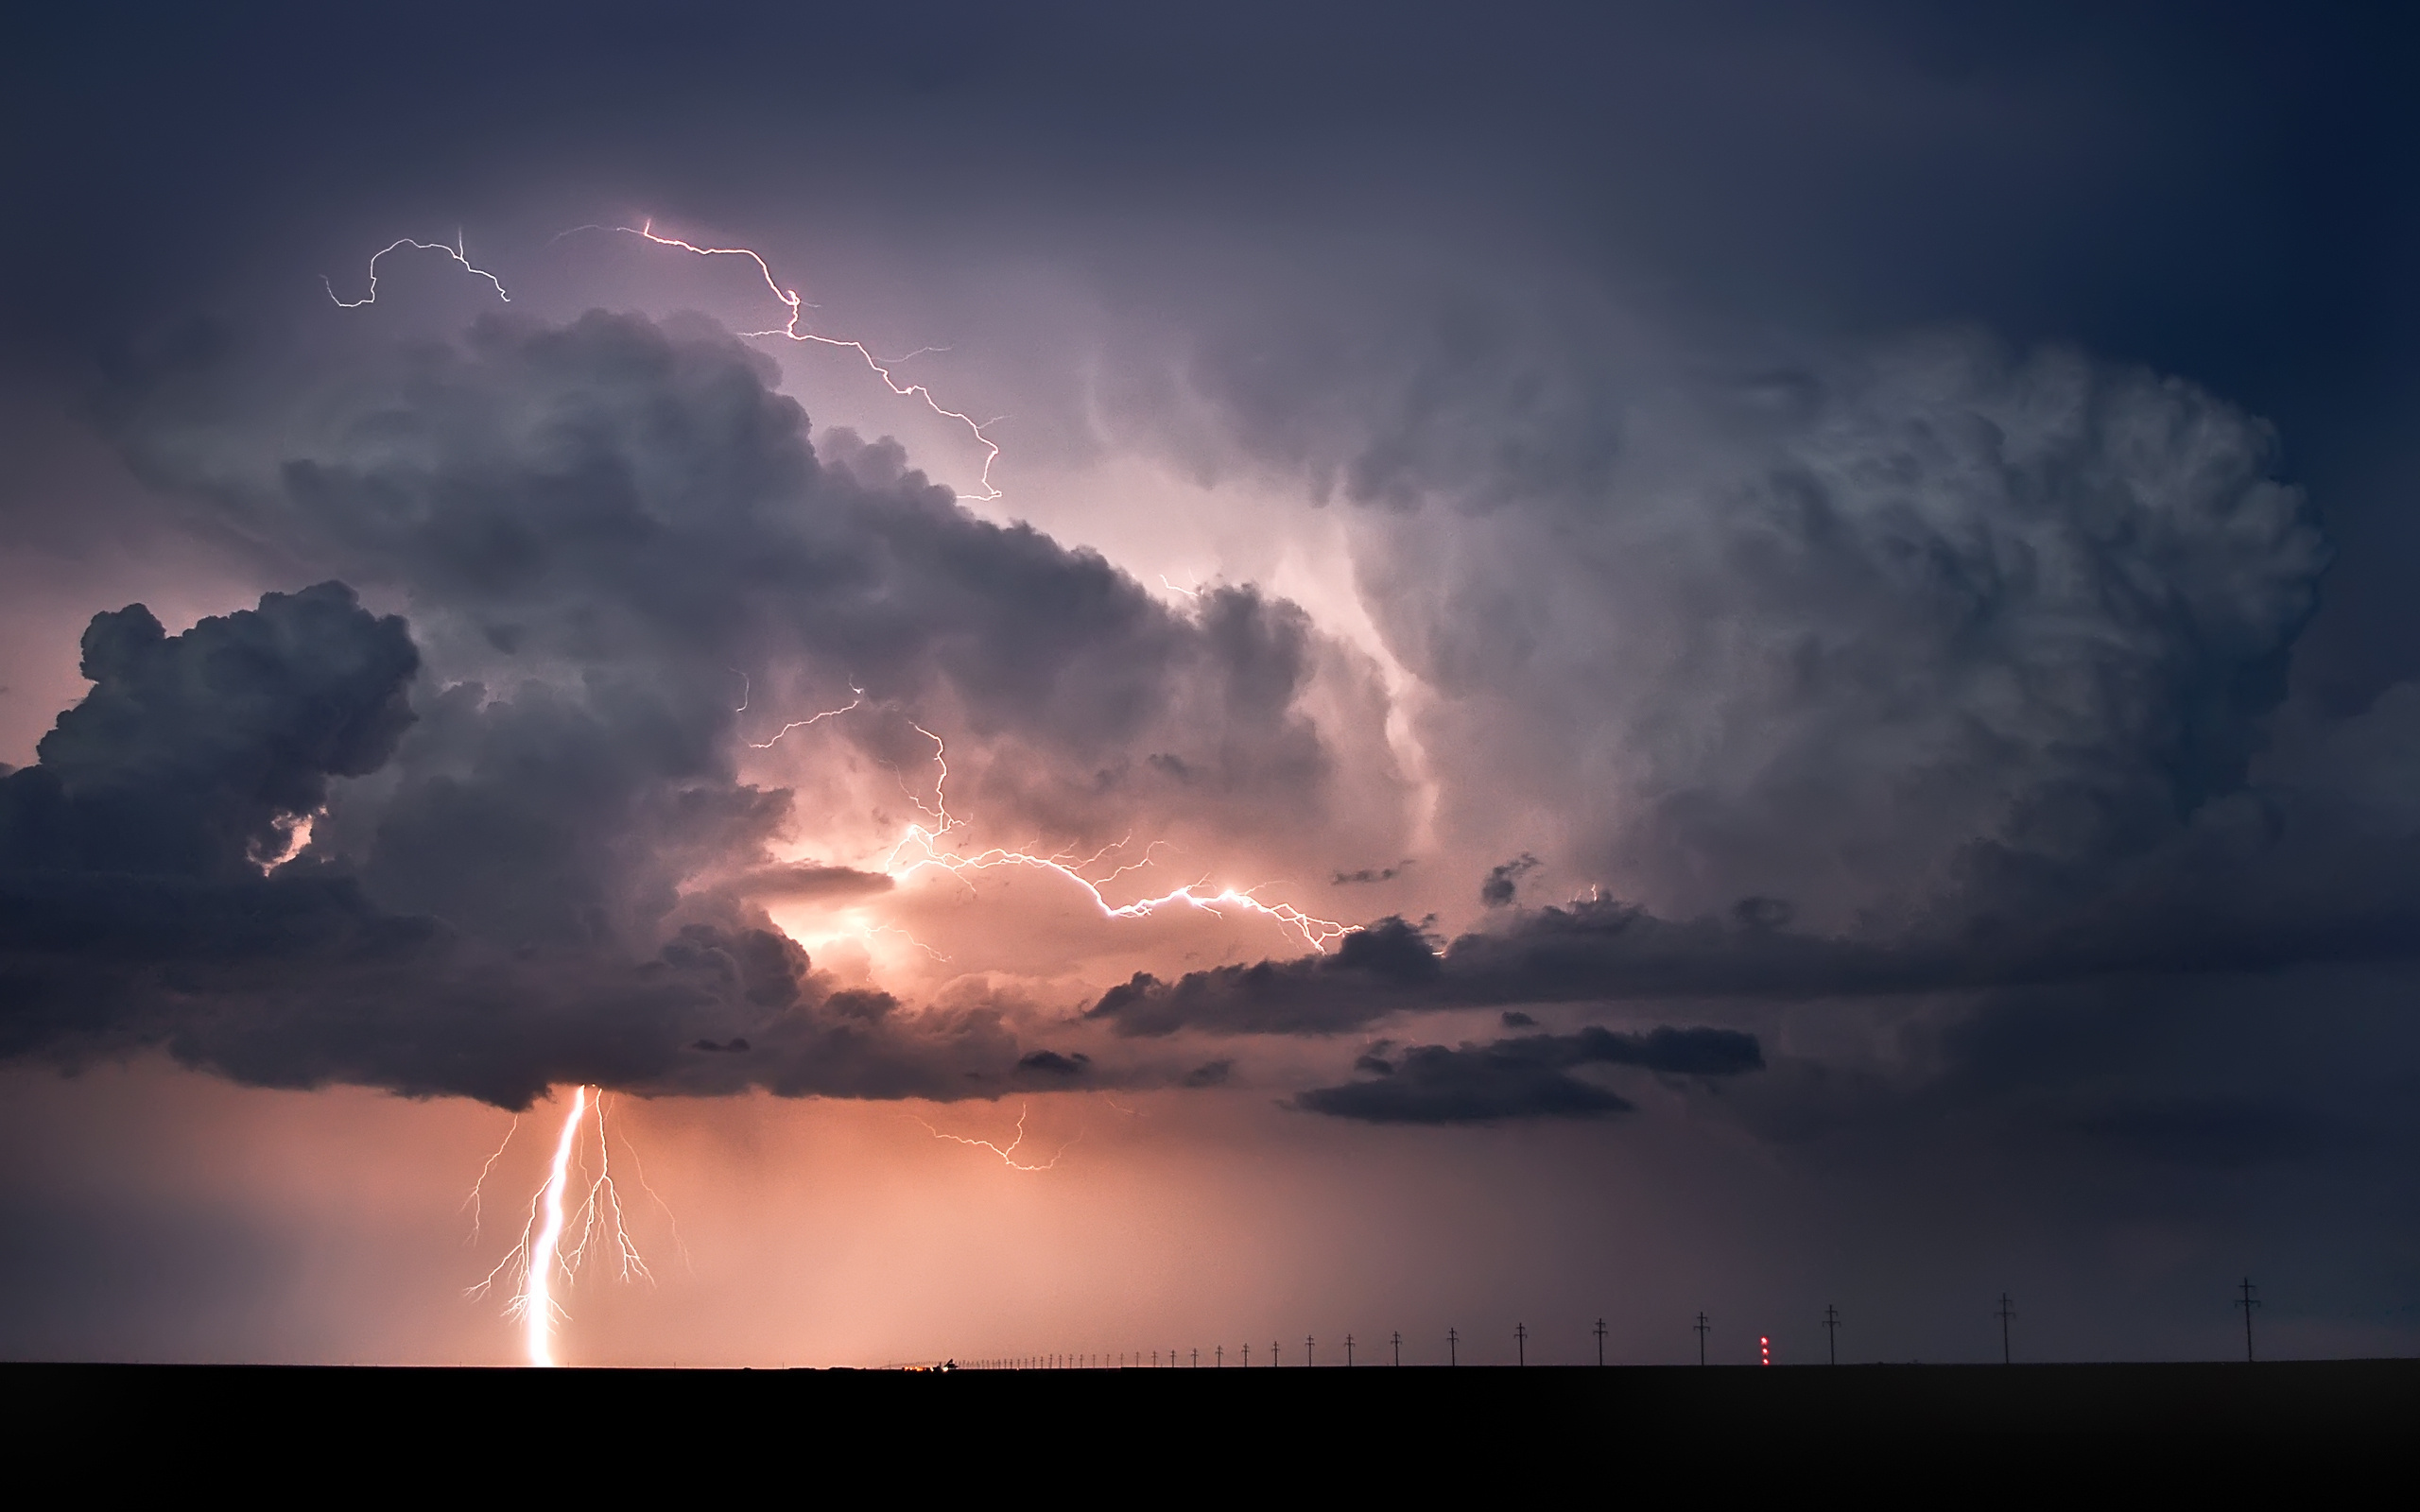 молния, природа, стихия, небо, облака, фон, 1000000000 вольт, 400000 а